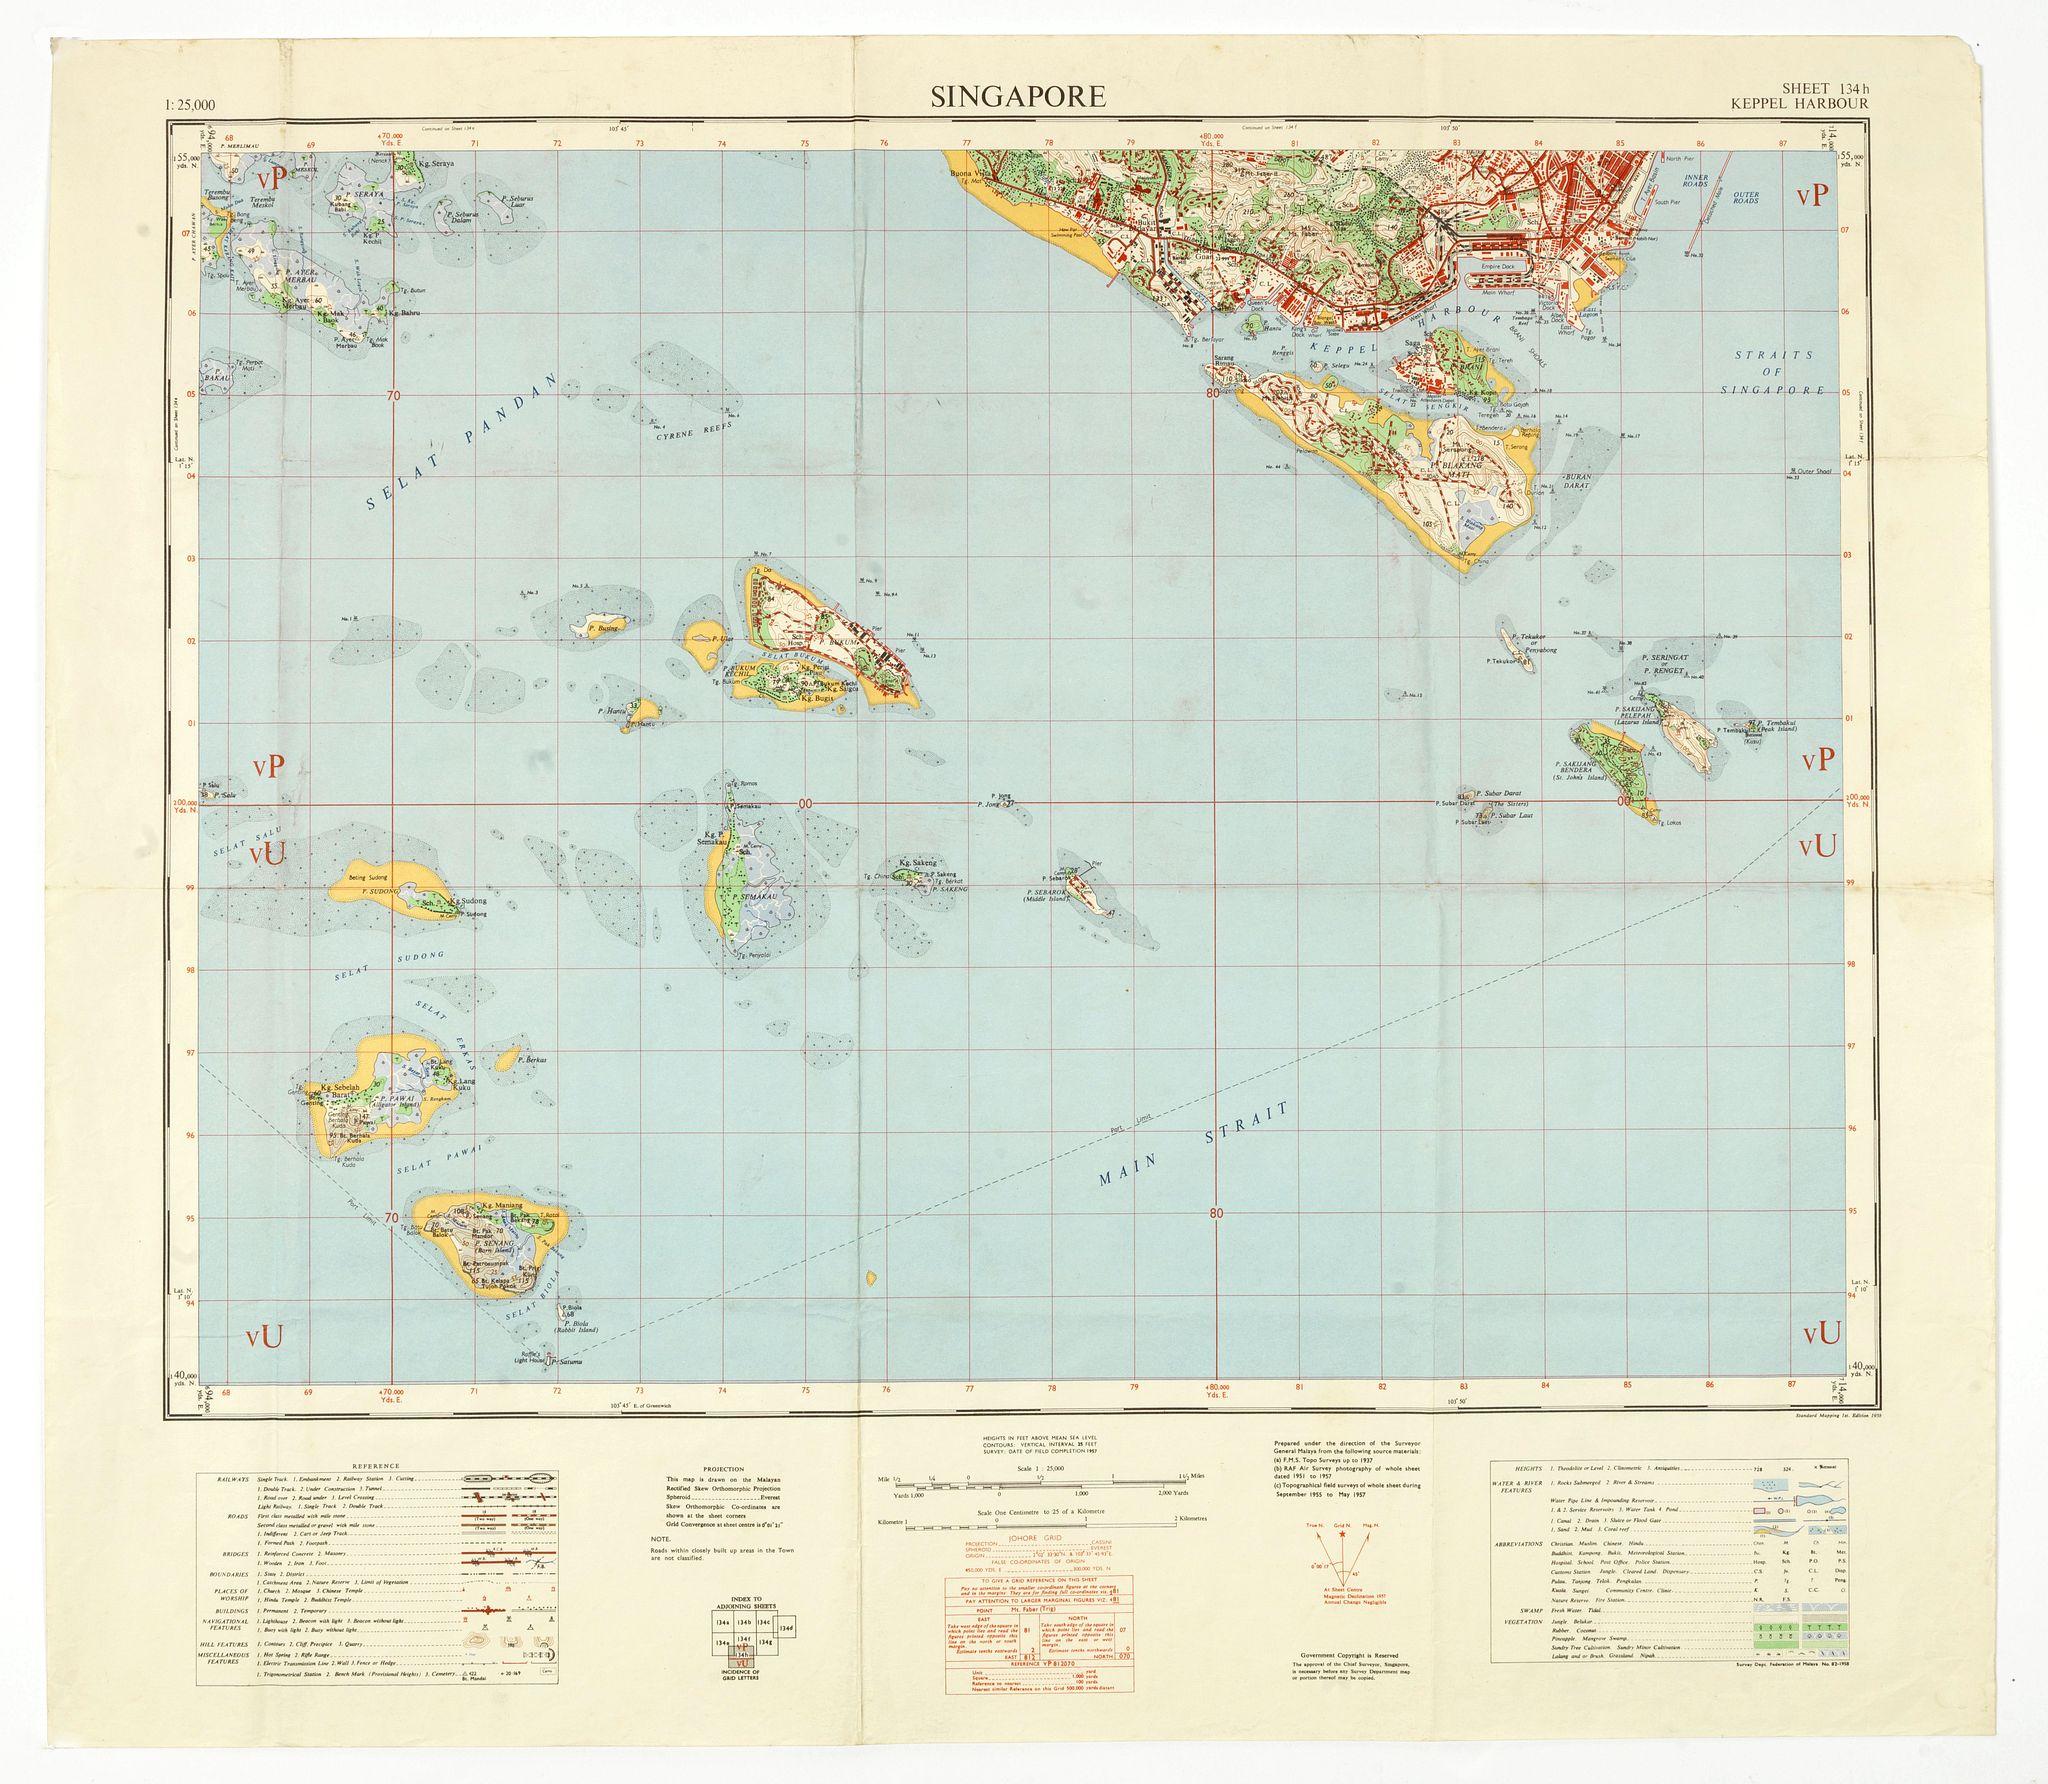 SURVEY DEPT. FEDERATION OF MALAYA -  Singapore. - Sheet 134h Keppel harbour.